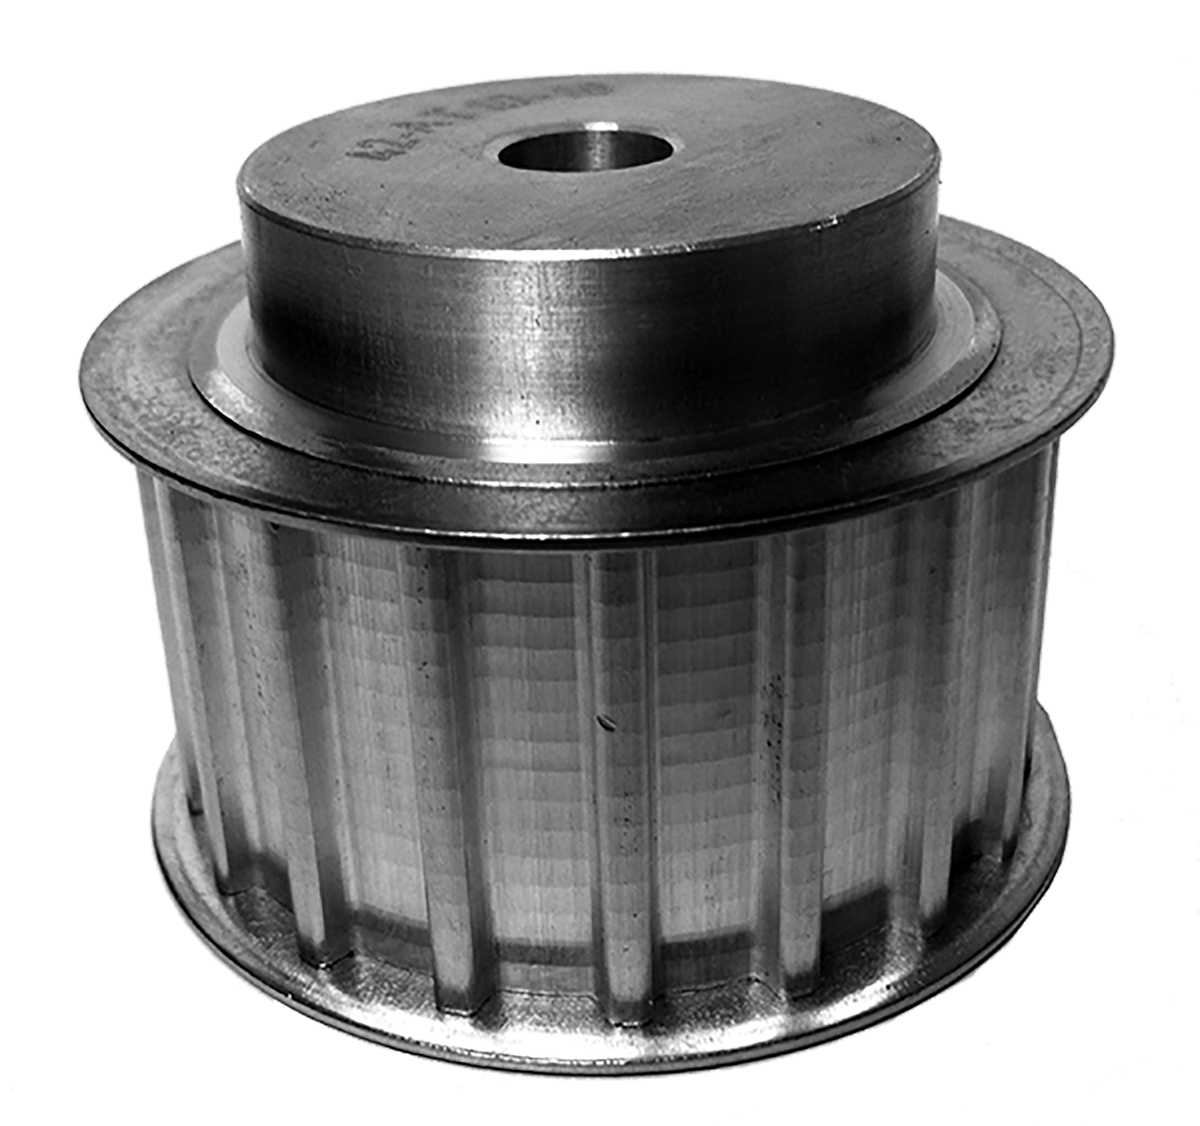 42AT10/40-2 - Aluminum Metric Pulleys